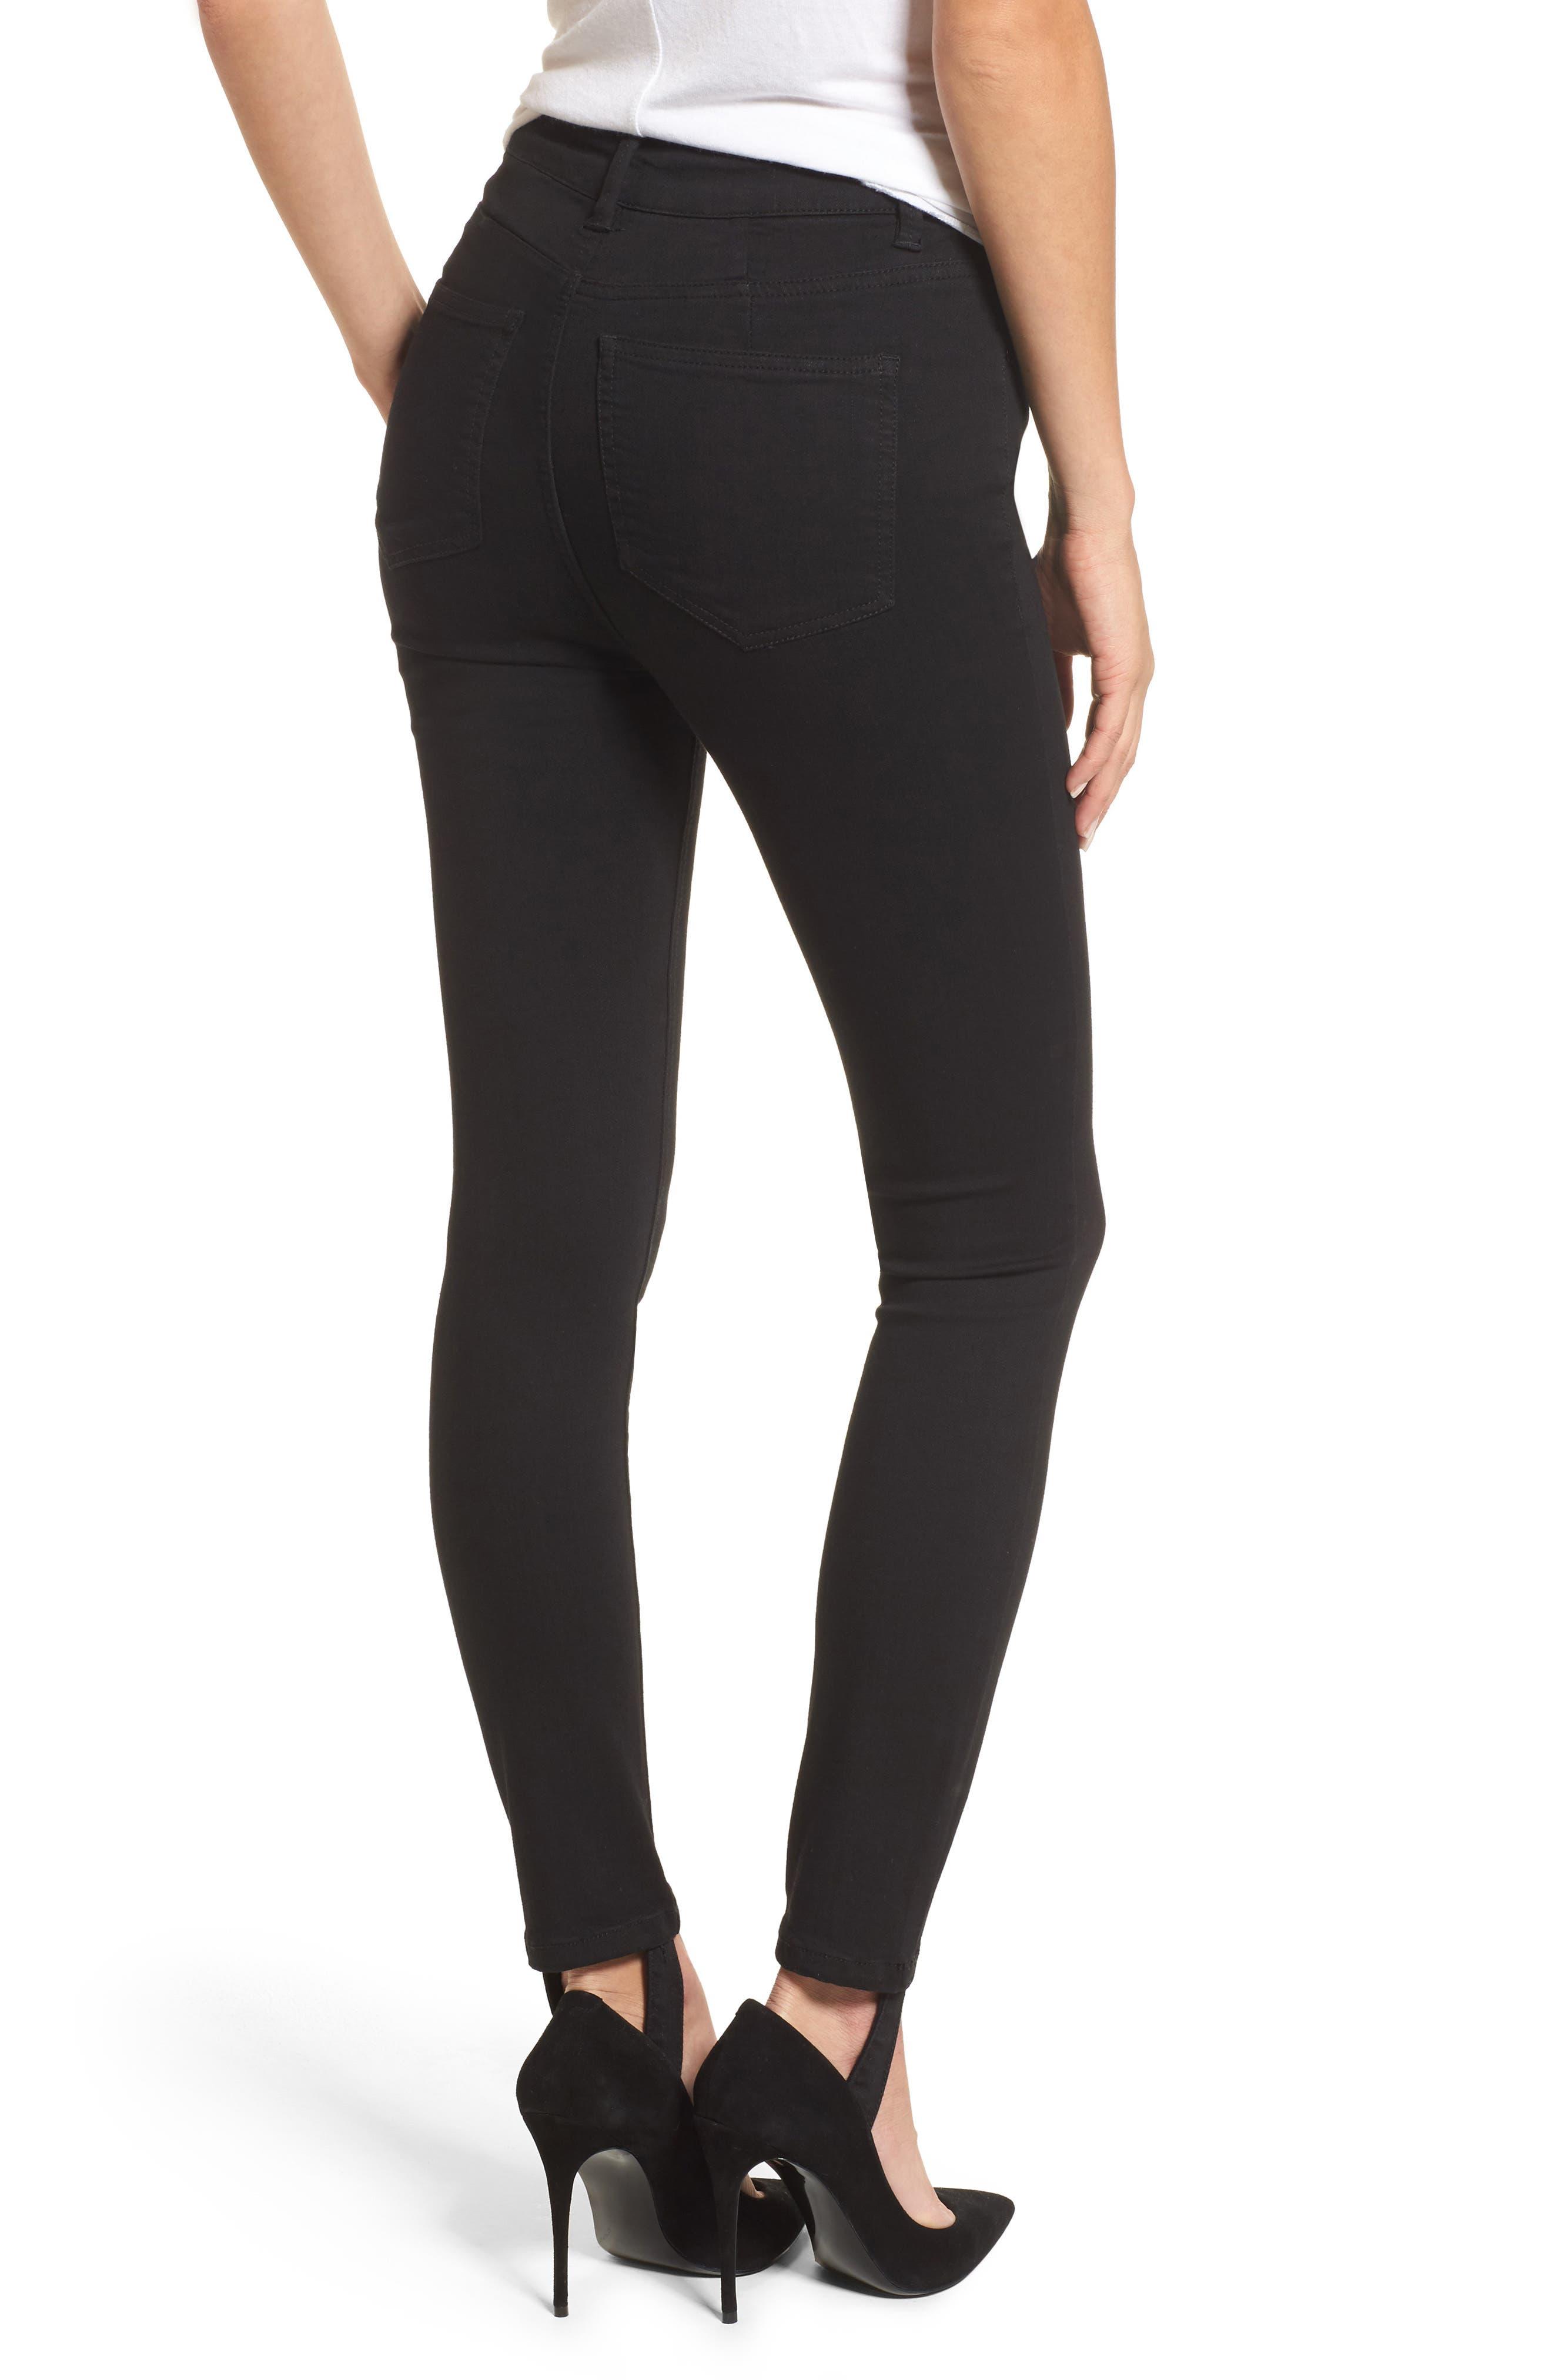 Luma High Waist Skinny Stirrup Jeans,                             Alternate thumbnail 2, color,                             002